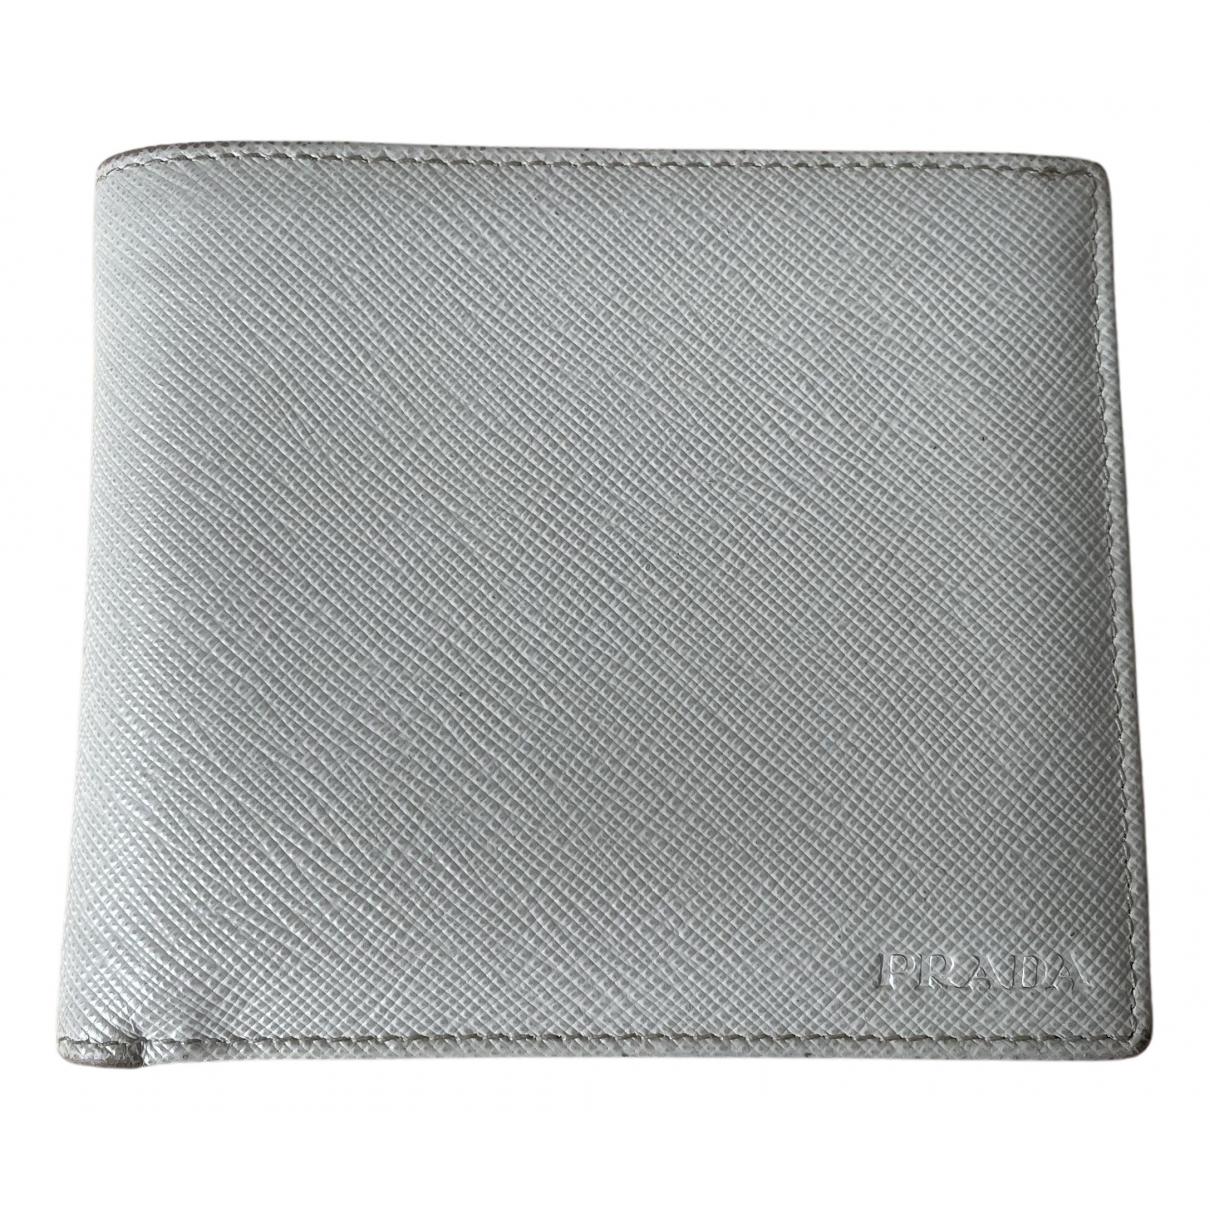 Prada N Ecru Leather Small bag, wallet & cases for Men N